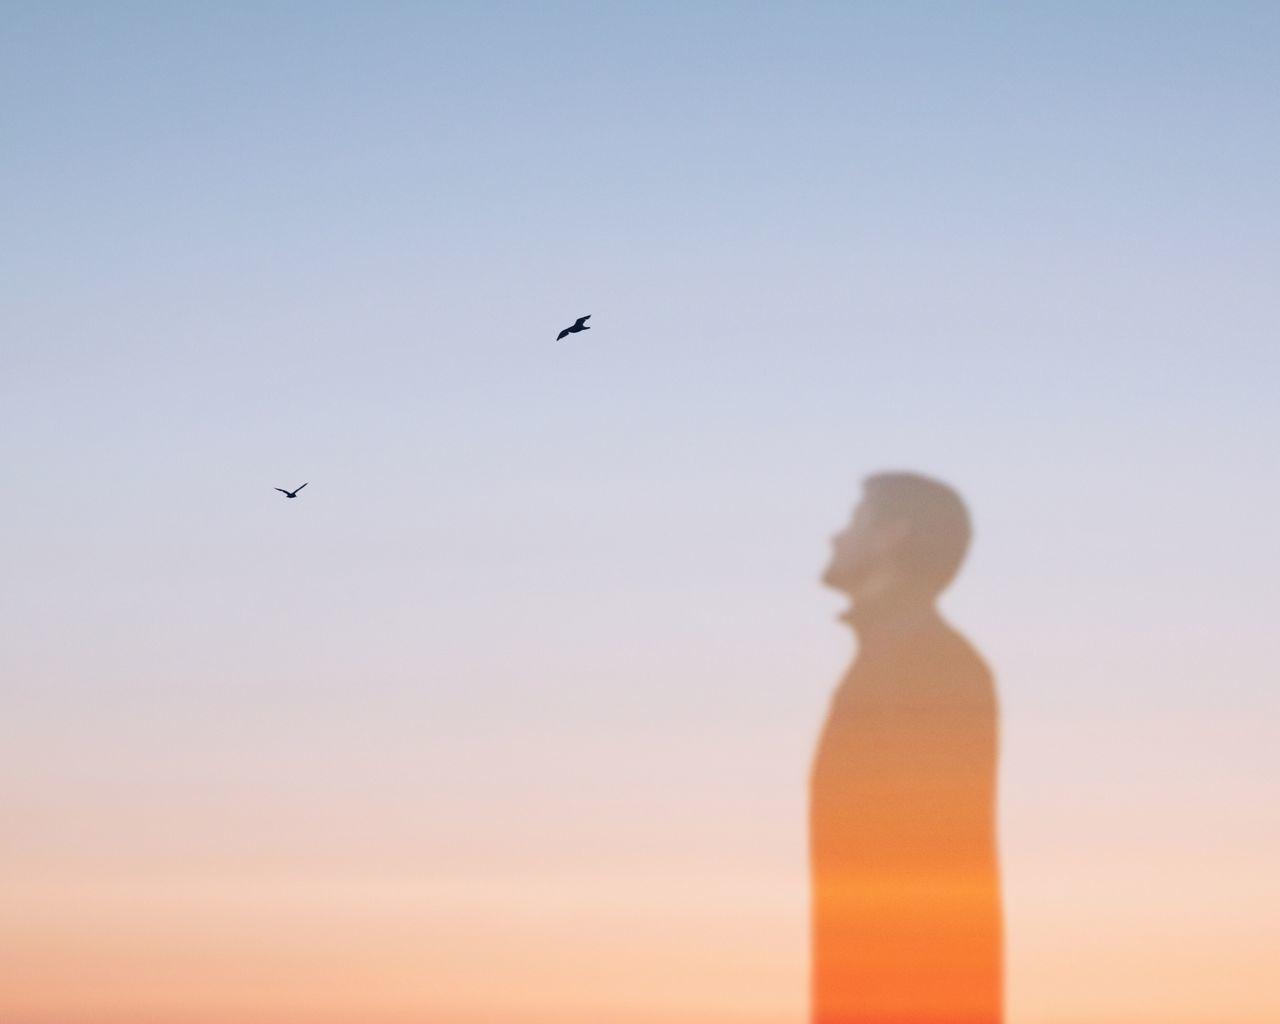 bird Clear sky sky outdoors dawn Multiple Exposures transparent Ghost Dream Escaping cold temperature EyeEm Best Edits EyeEmBestPics beauty in Nature Silhouette EyeEm Best Shots TheWeekOnEyeEM